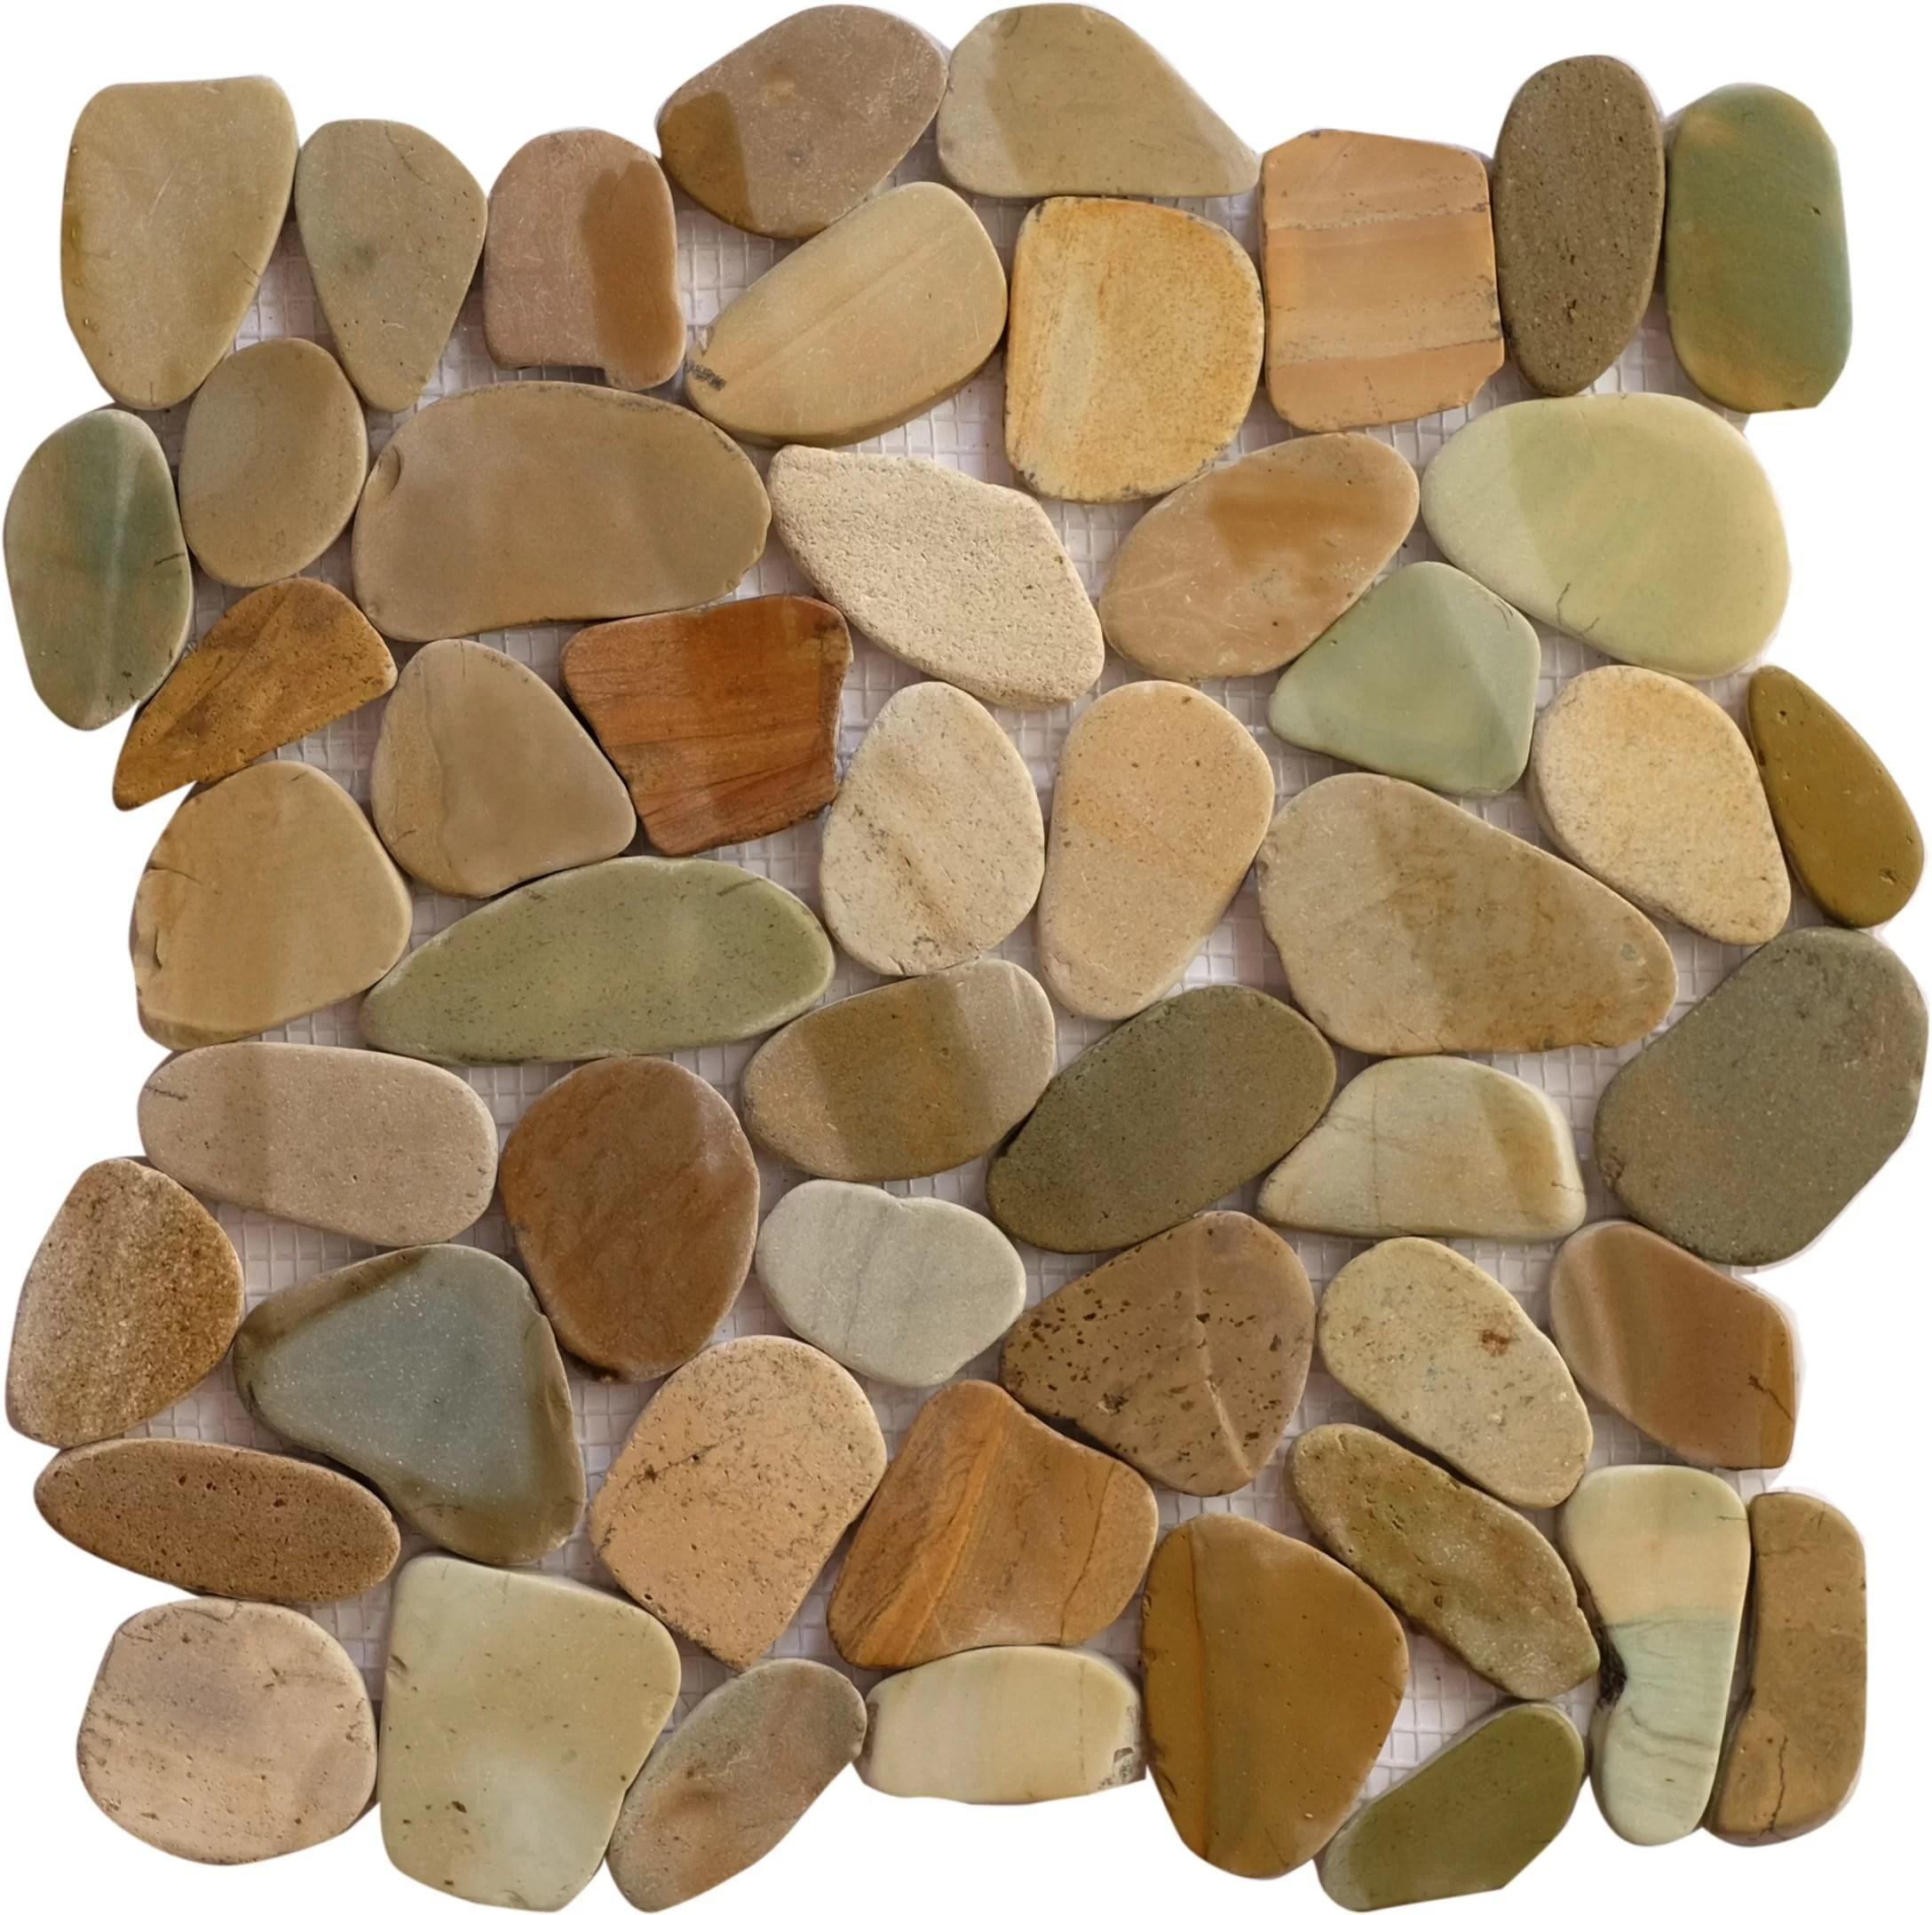 bali mix random sized natural stone mosaic tile in brown tan